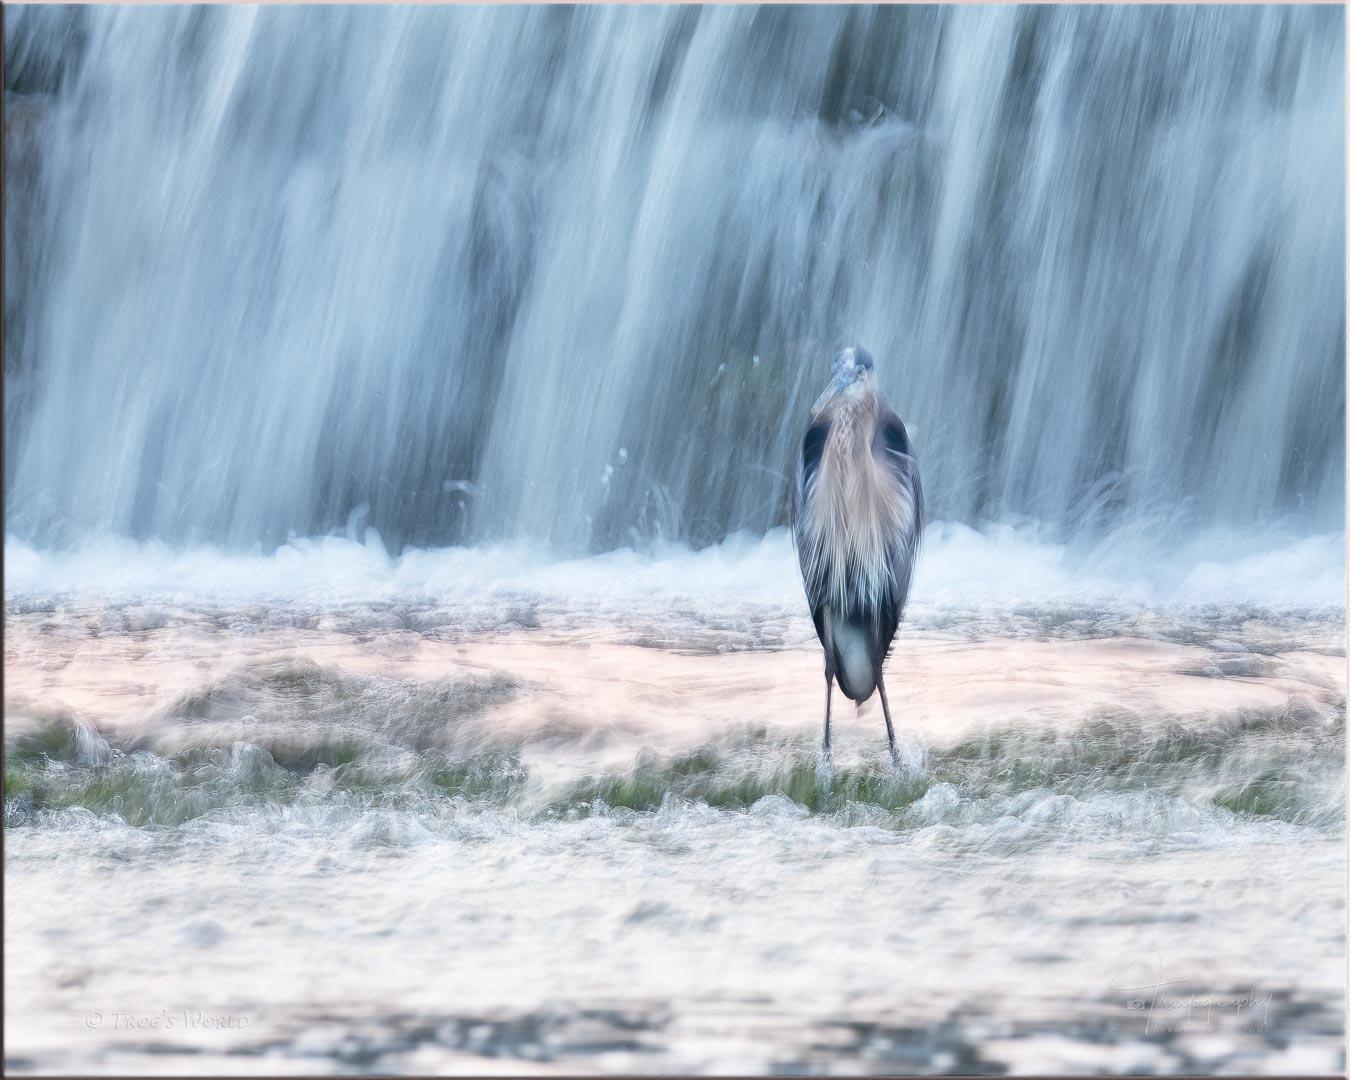 Blue Heron and waterfall